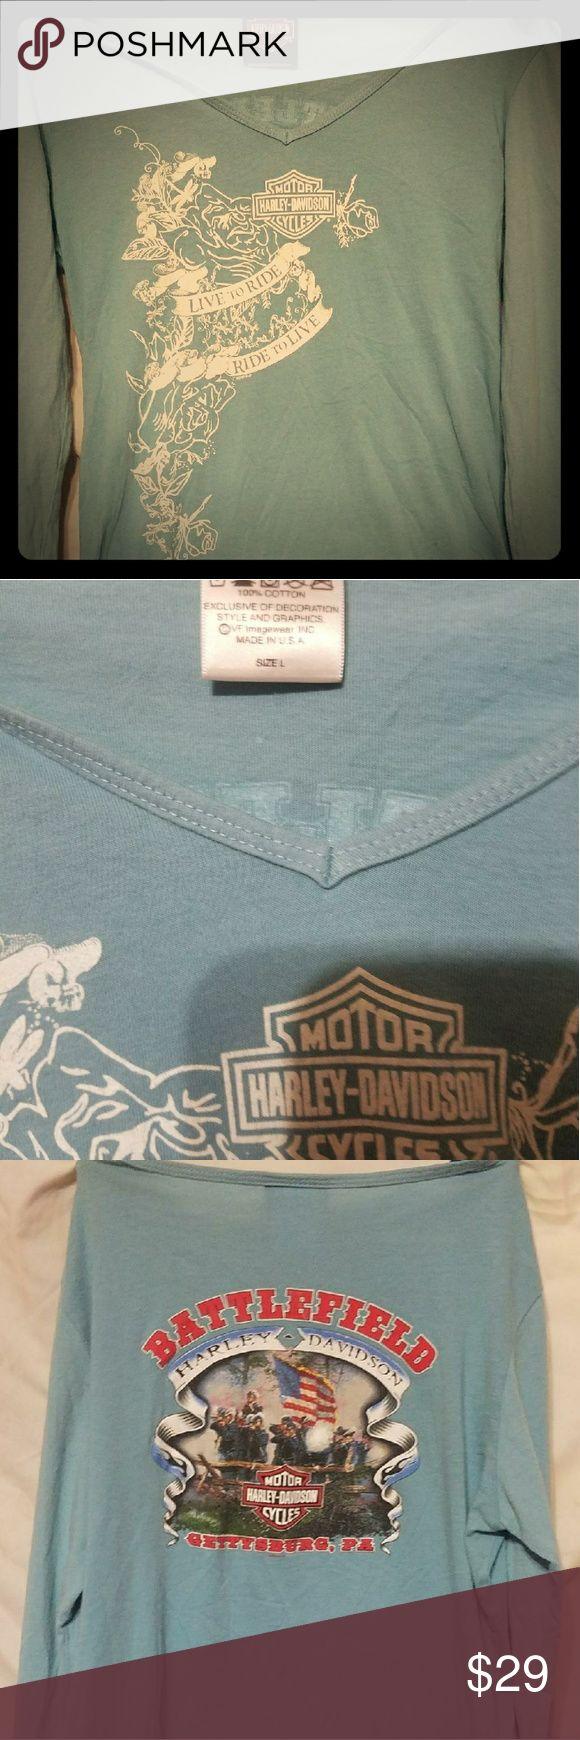 Harley davidson long sleeve shirt Great condition harley shirt Baby blue color Bought from pittsburgh harley dealer Harley-Davidson Tops Tees - Long Sleeve